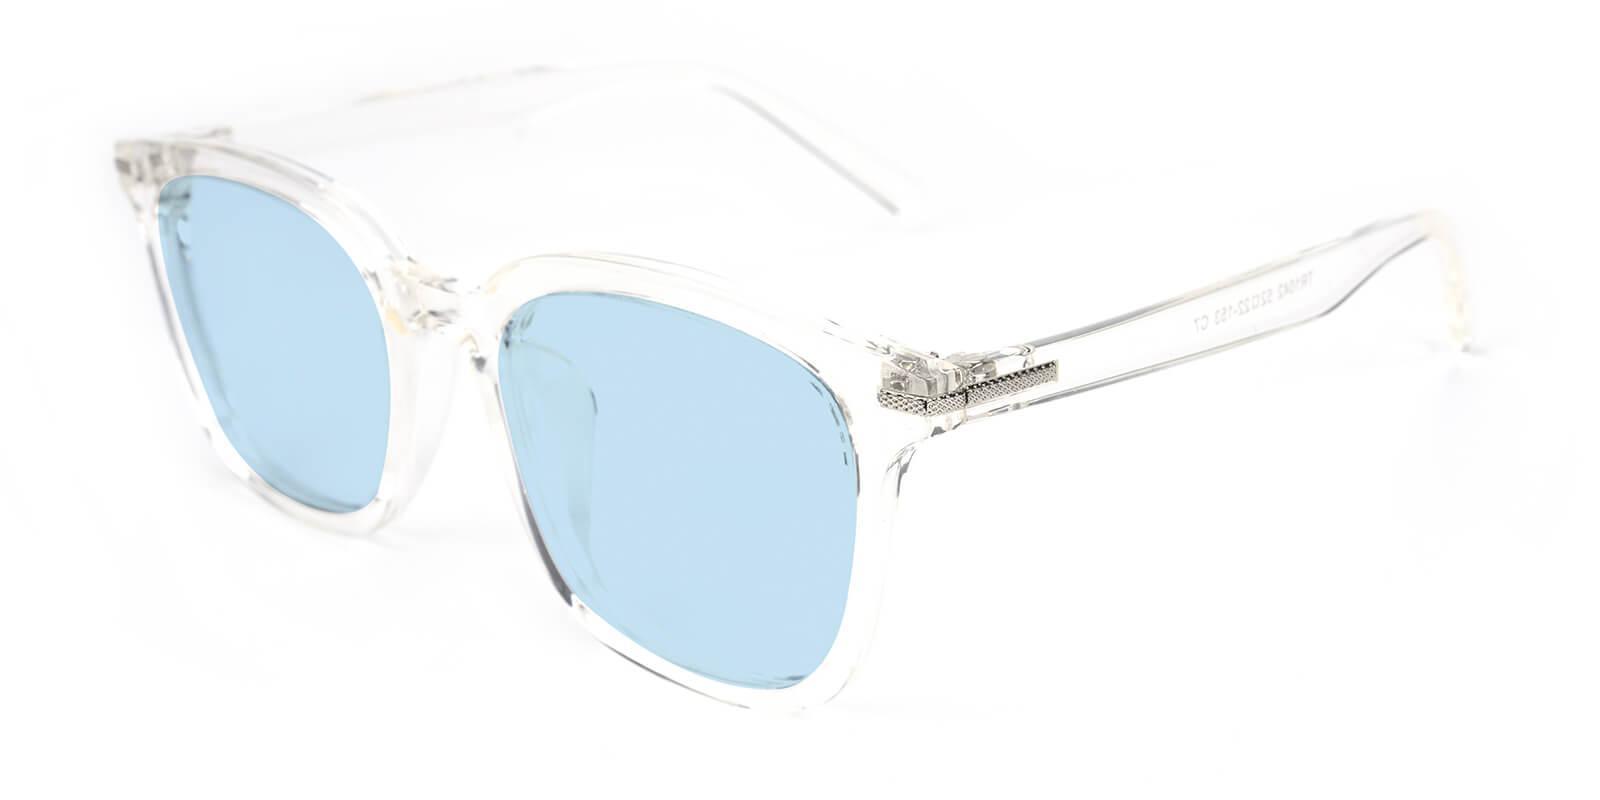 Mark-Translucent-Square-TR-Sunglasses-additional1